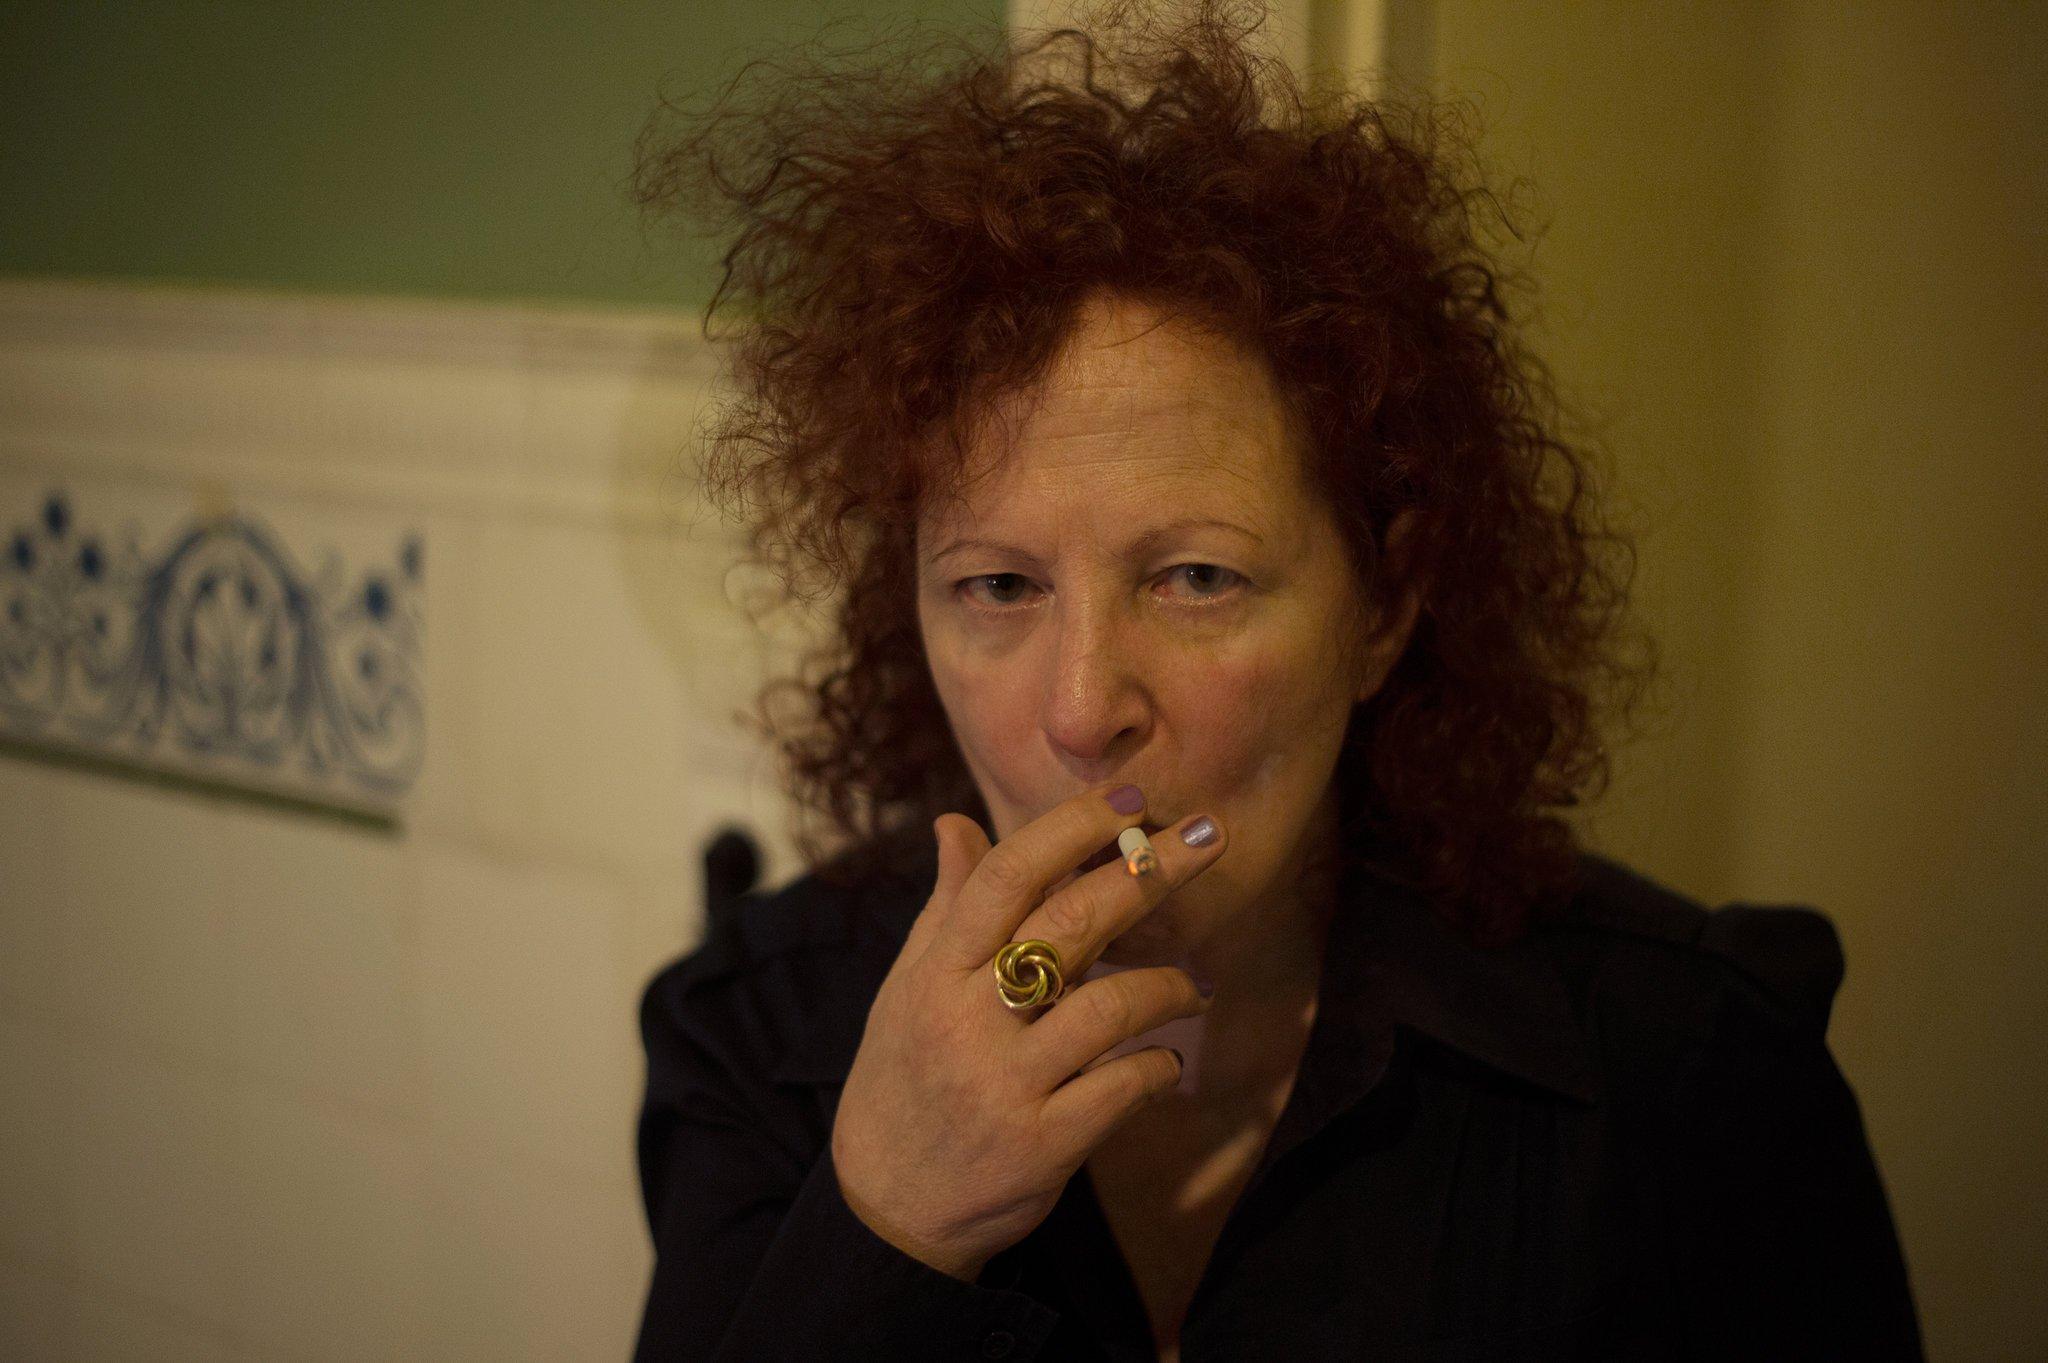 Self-Portrait 1st Time on Oxy, Berlin, 2014. © Nan Goldin, via Artforum